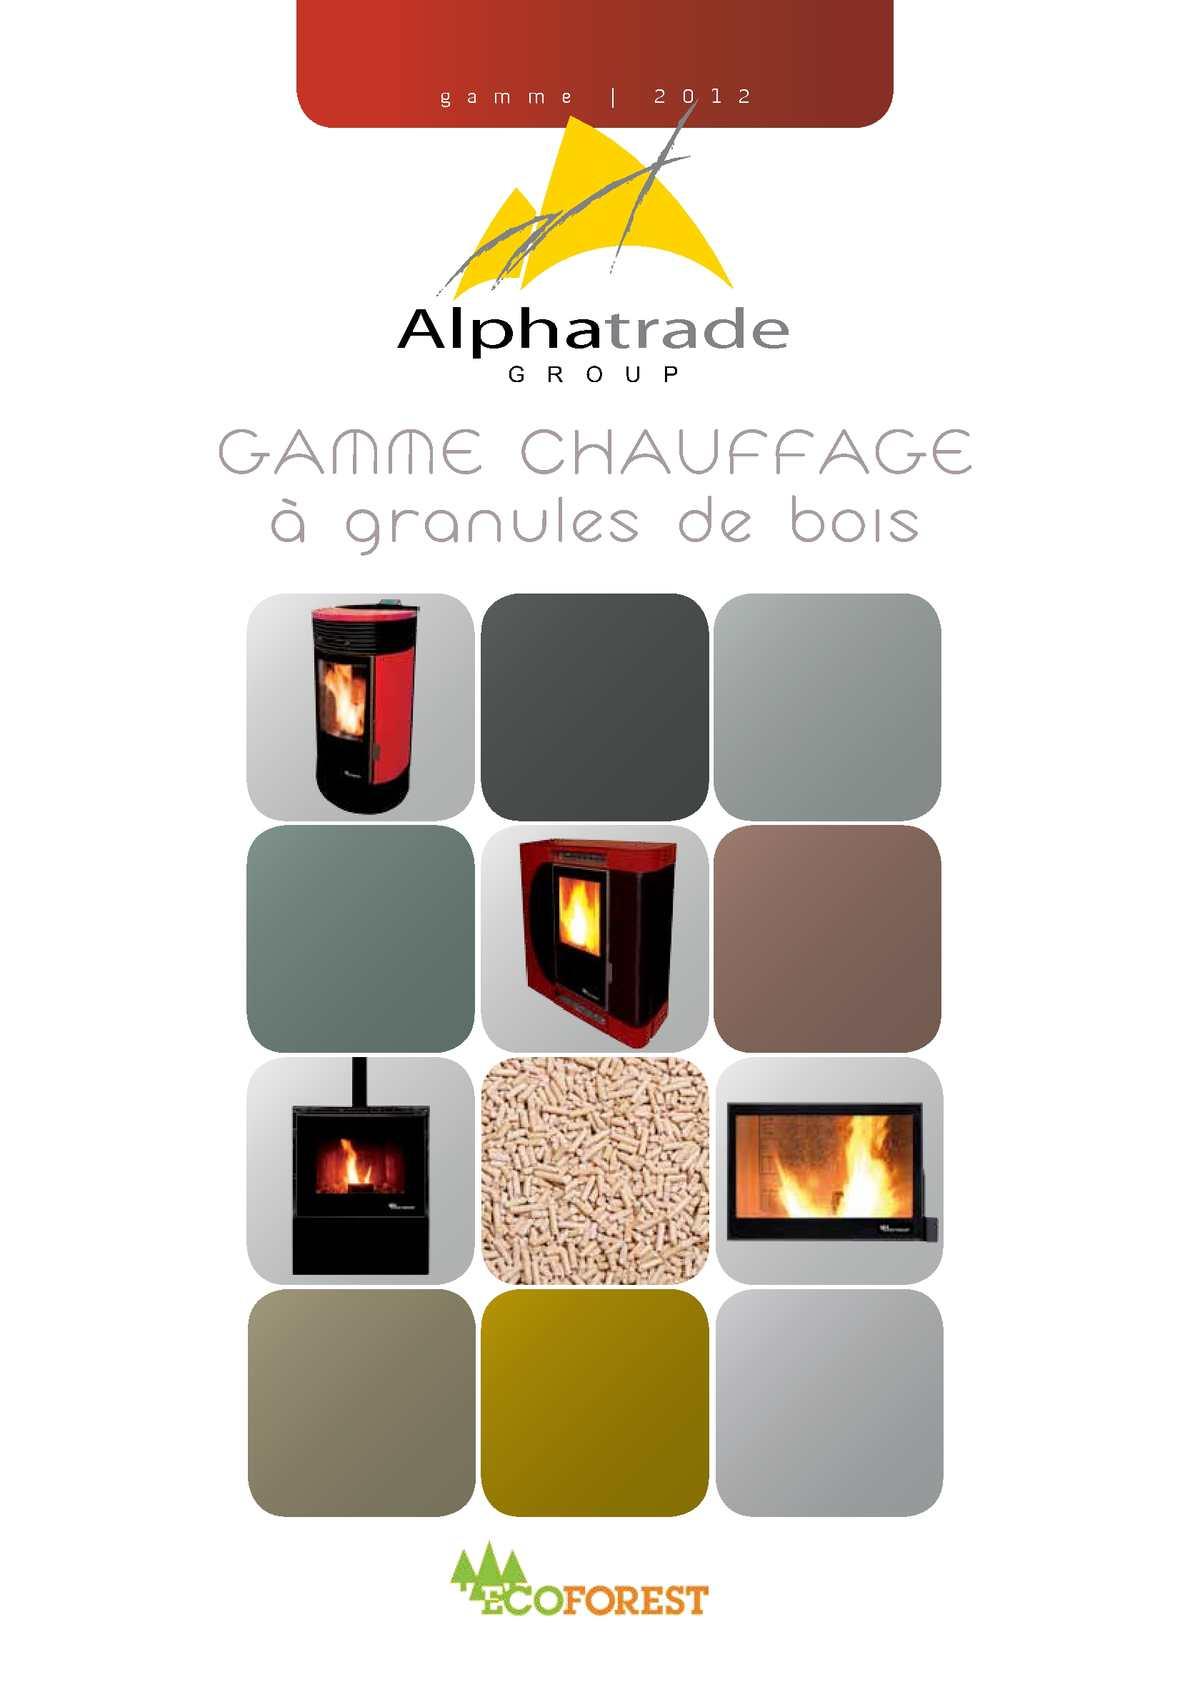 calam o alphatrade group gamme chauffage granules de. Black Bedroom Furniture Sets. Home Design Ideas